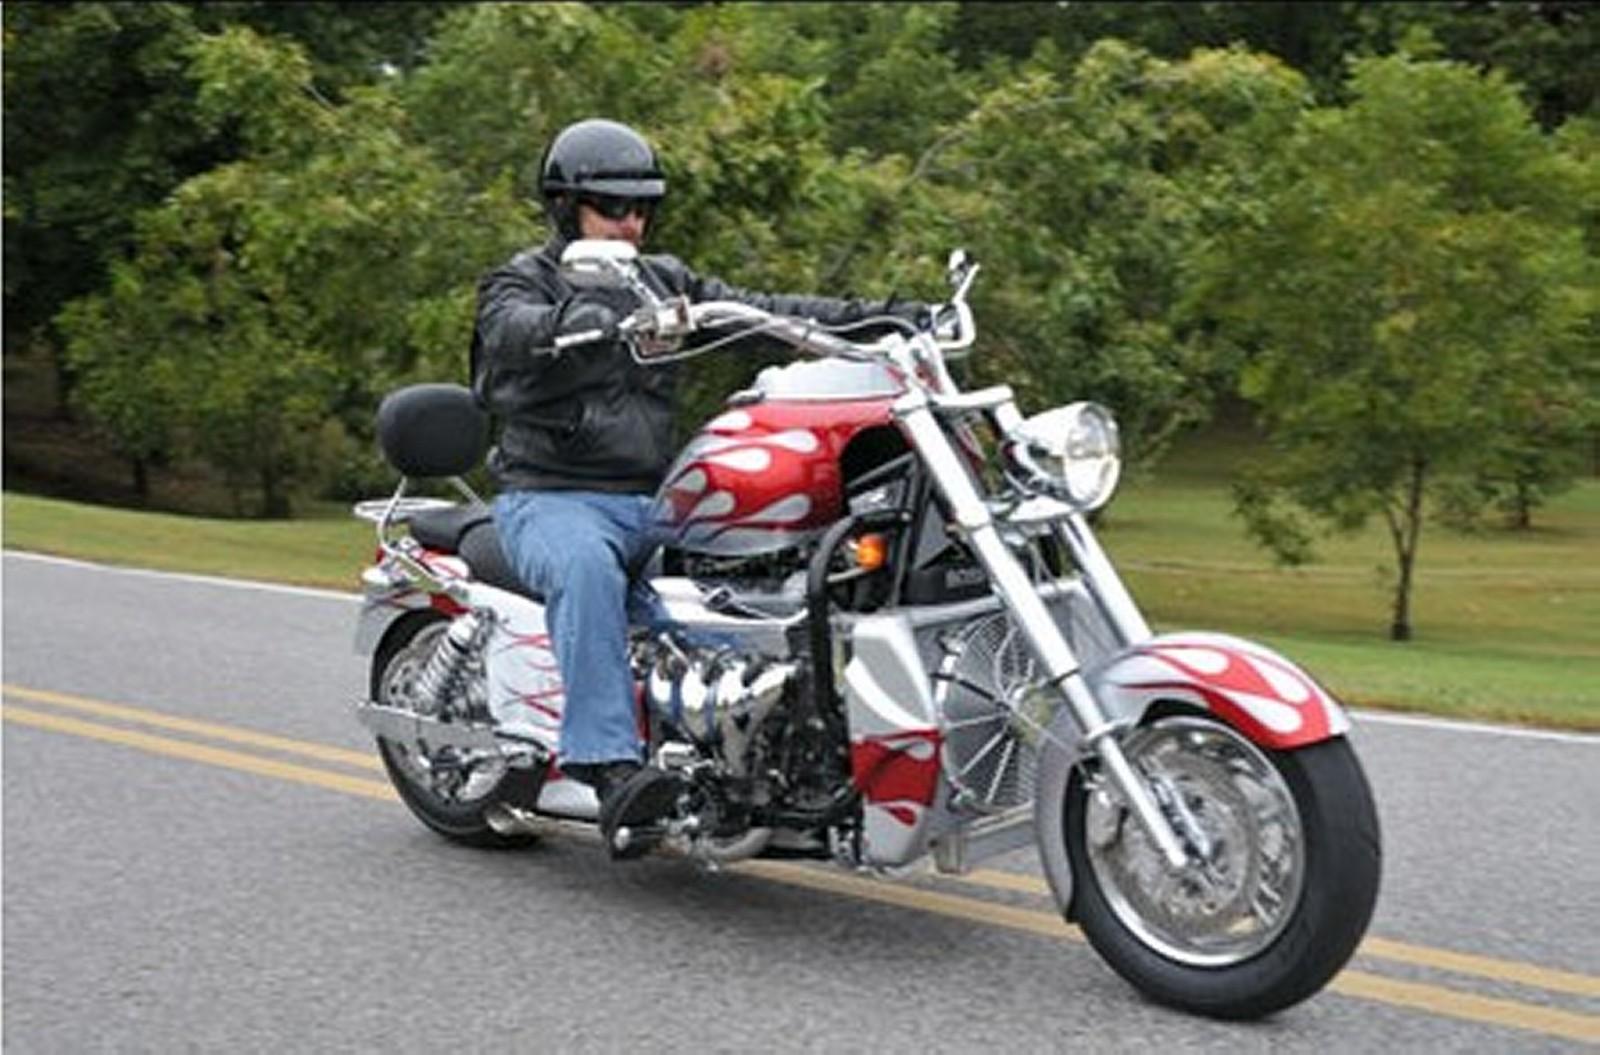 Boss Hog Frames : Motorcycle pictures boss hoss bhc ls ss bike